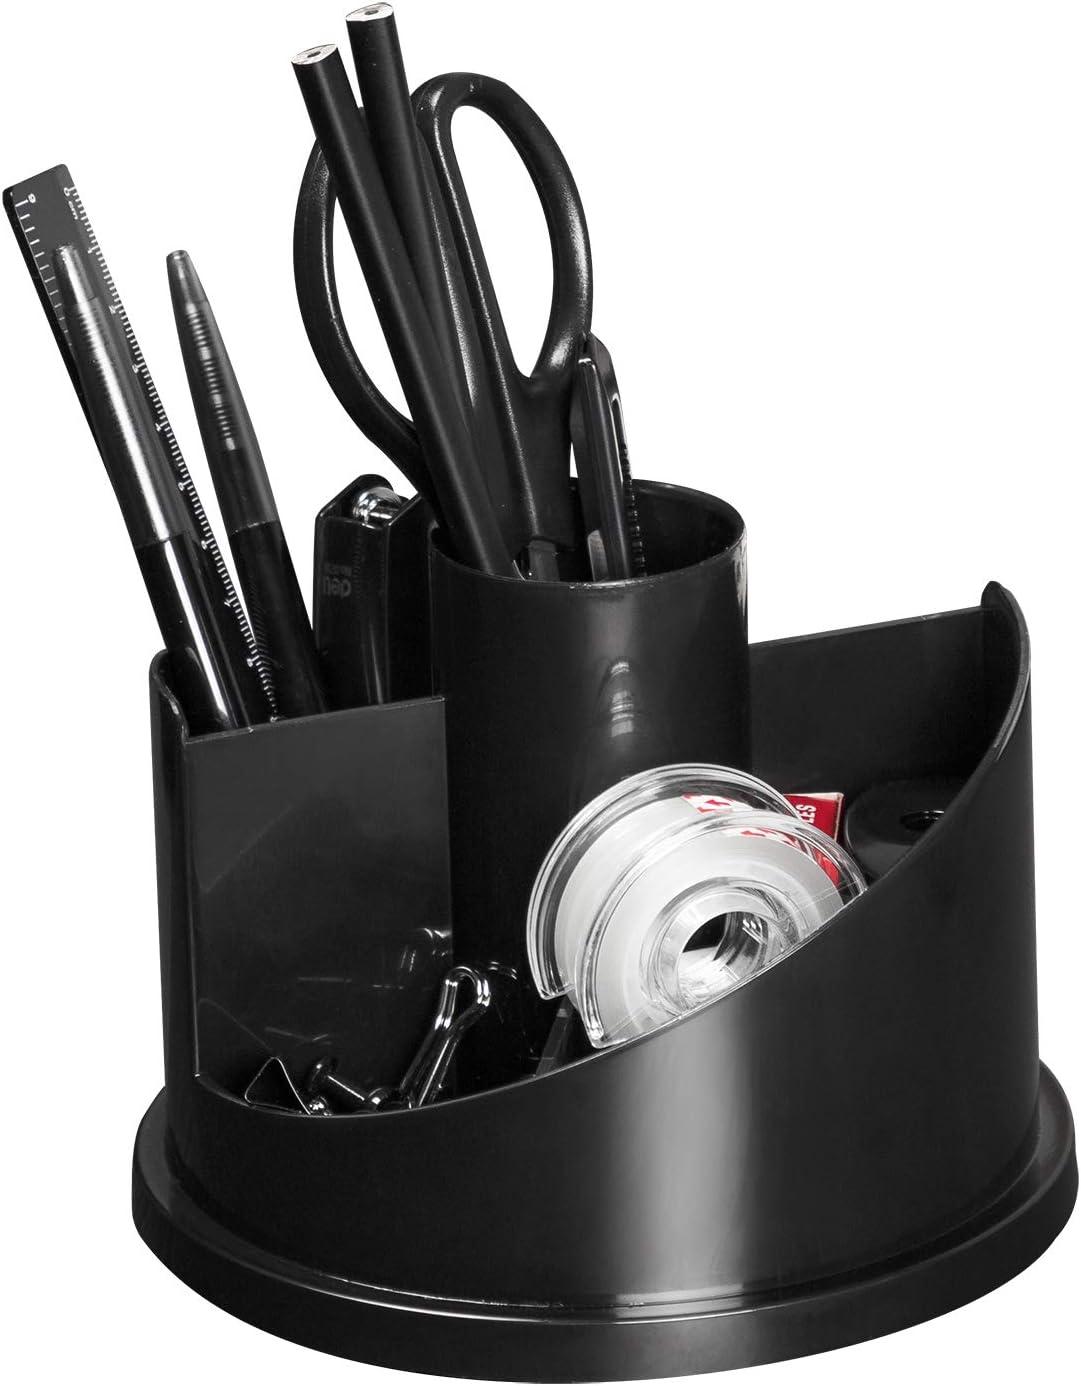 Deli Rotating Desk Organizer Pencil Holder Office Supplies Set, Includes Tape Dispenser, Pens, Stapler, Binder Clips, Sharpener, Scissor, Eraser for Desk Accessories, Black